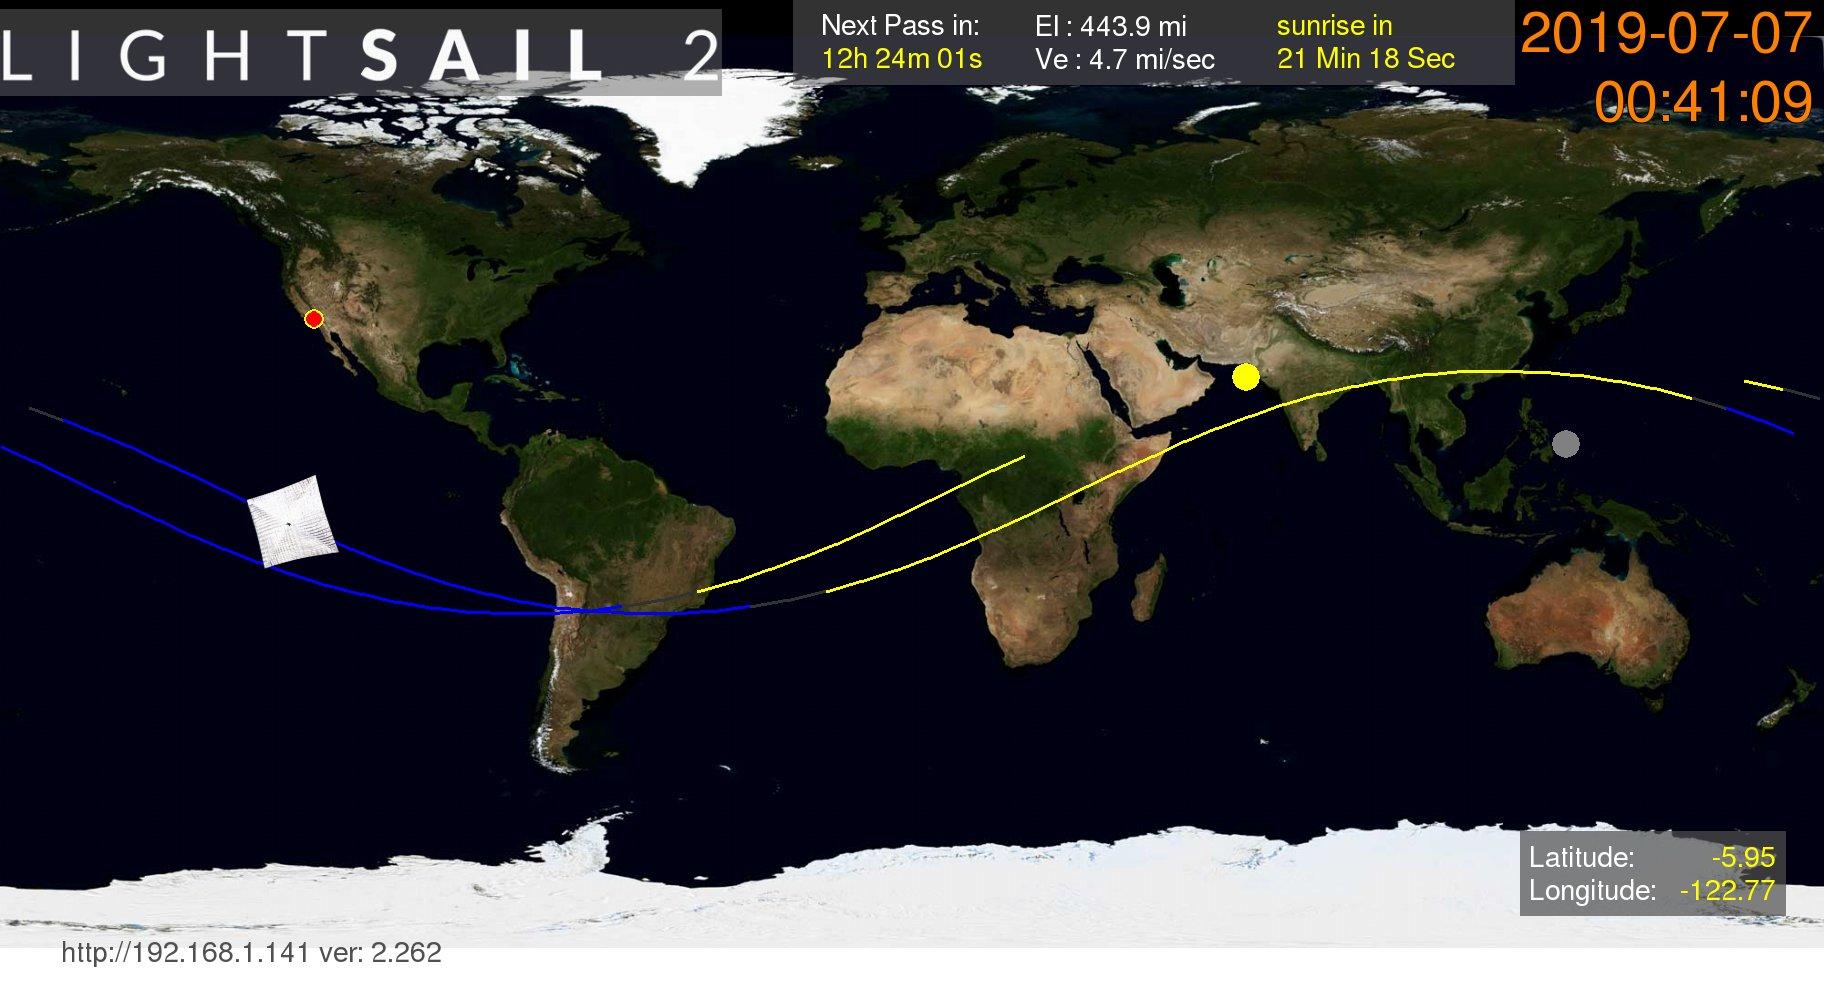 03_Orbit Track_-2019-07-07_00.41.09.710281.jpg